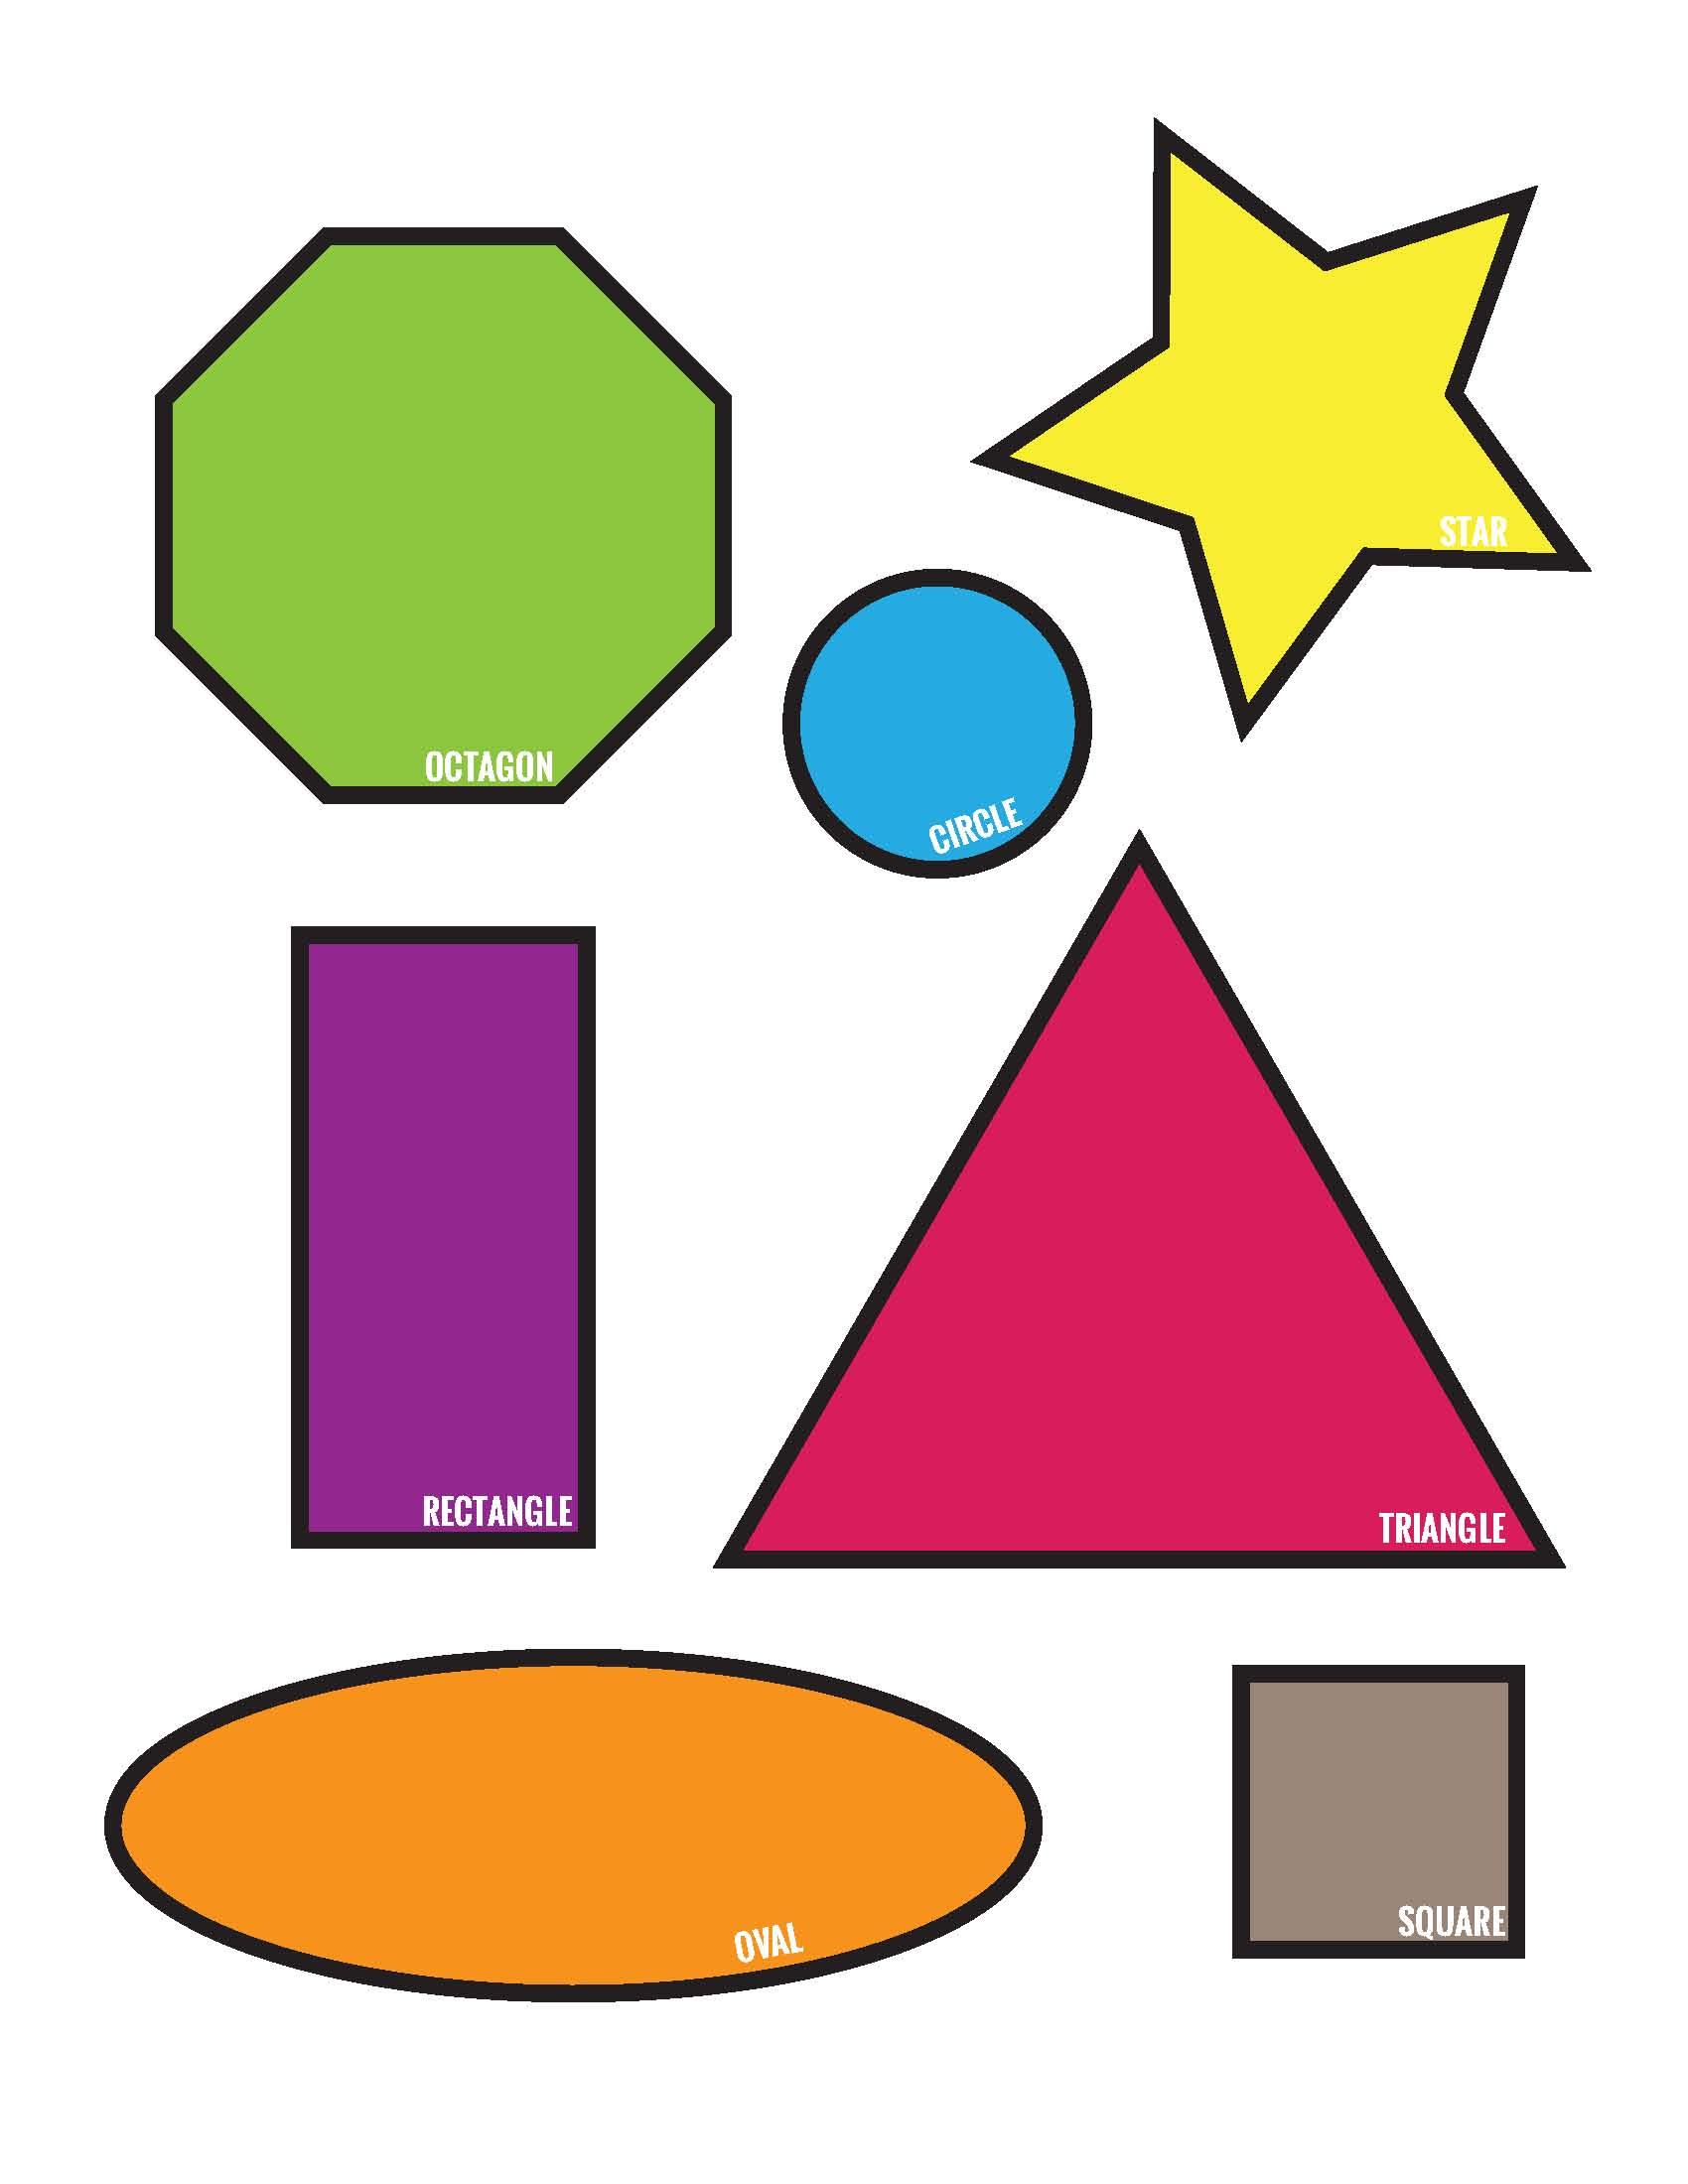 Freebies Colorful Shapes Matching File Folder Printable Game Free Download